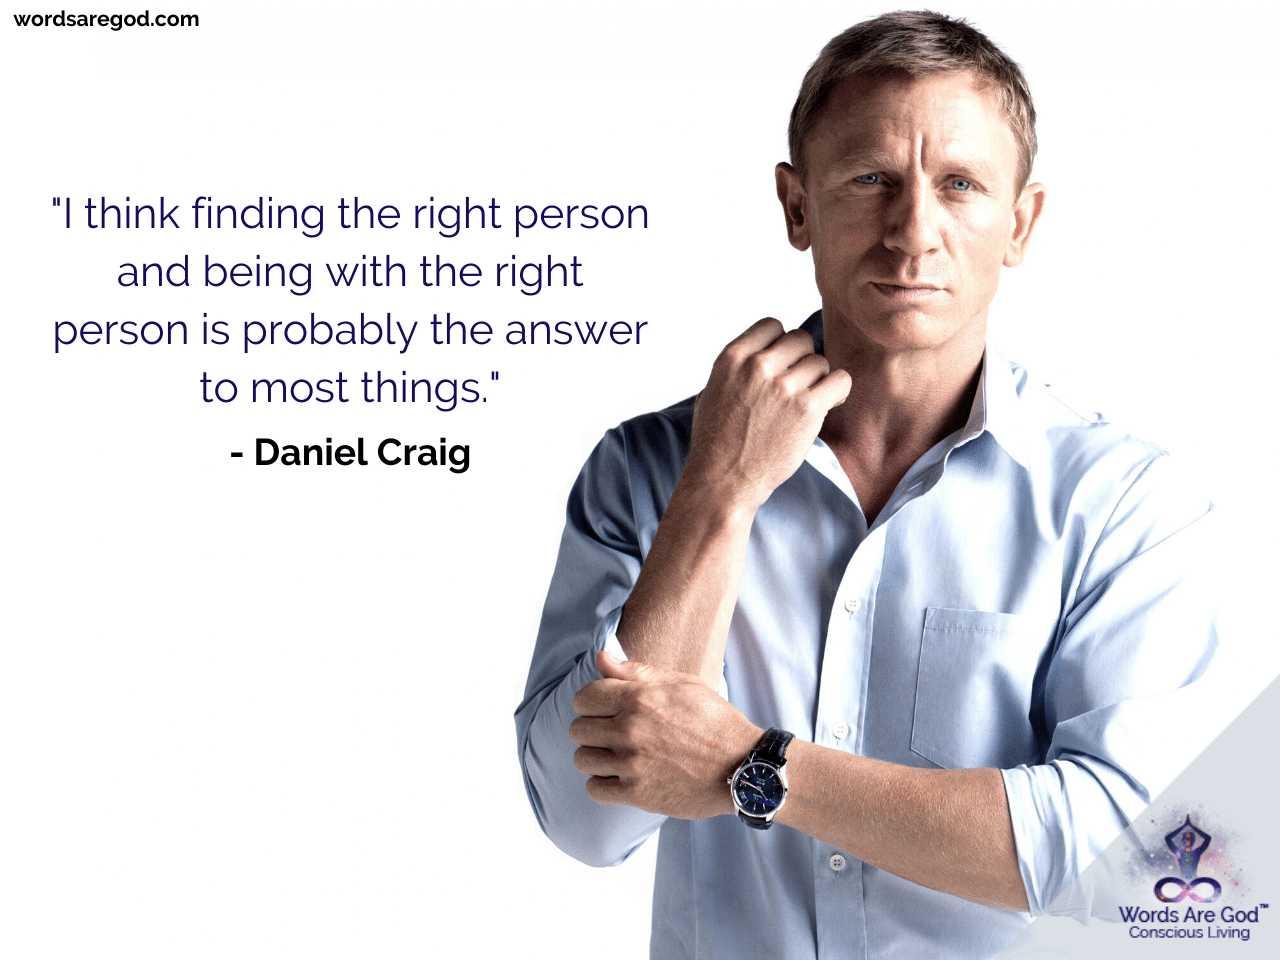 Daniel Craig Best Quotes by Daniel Craig